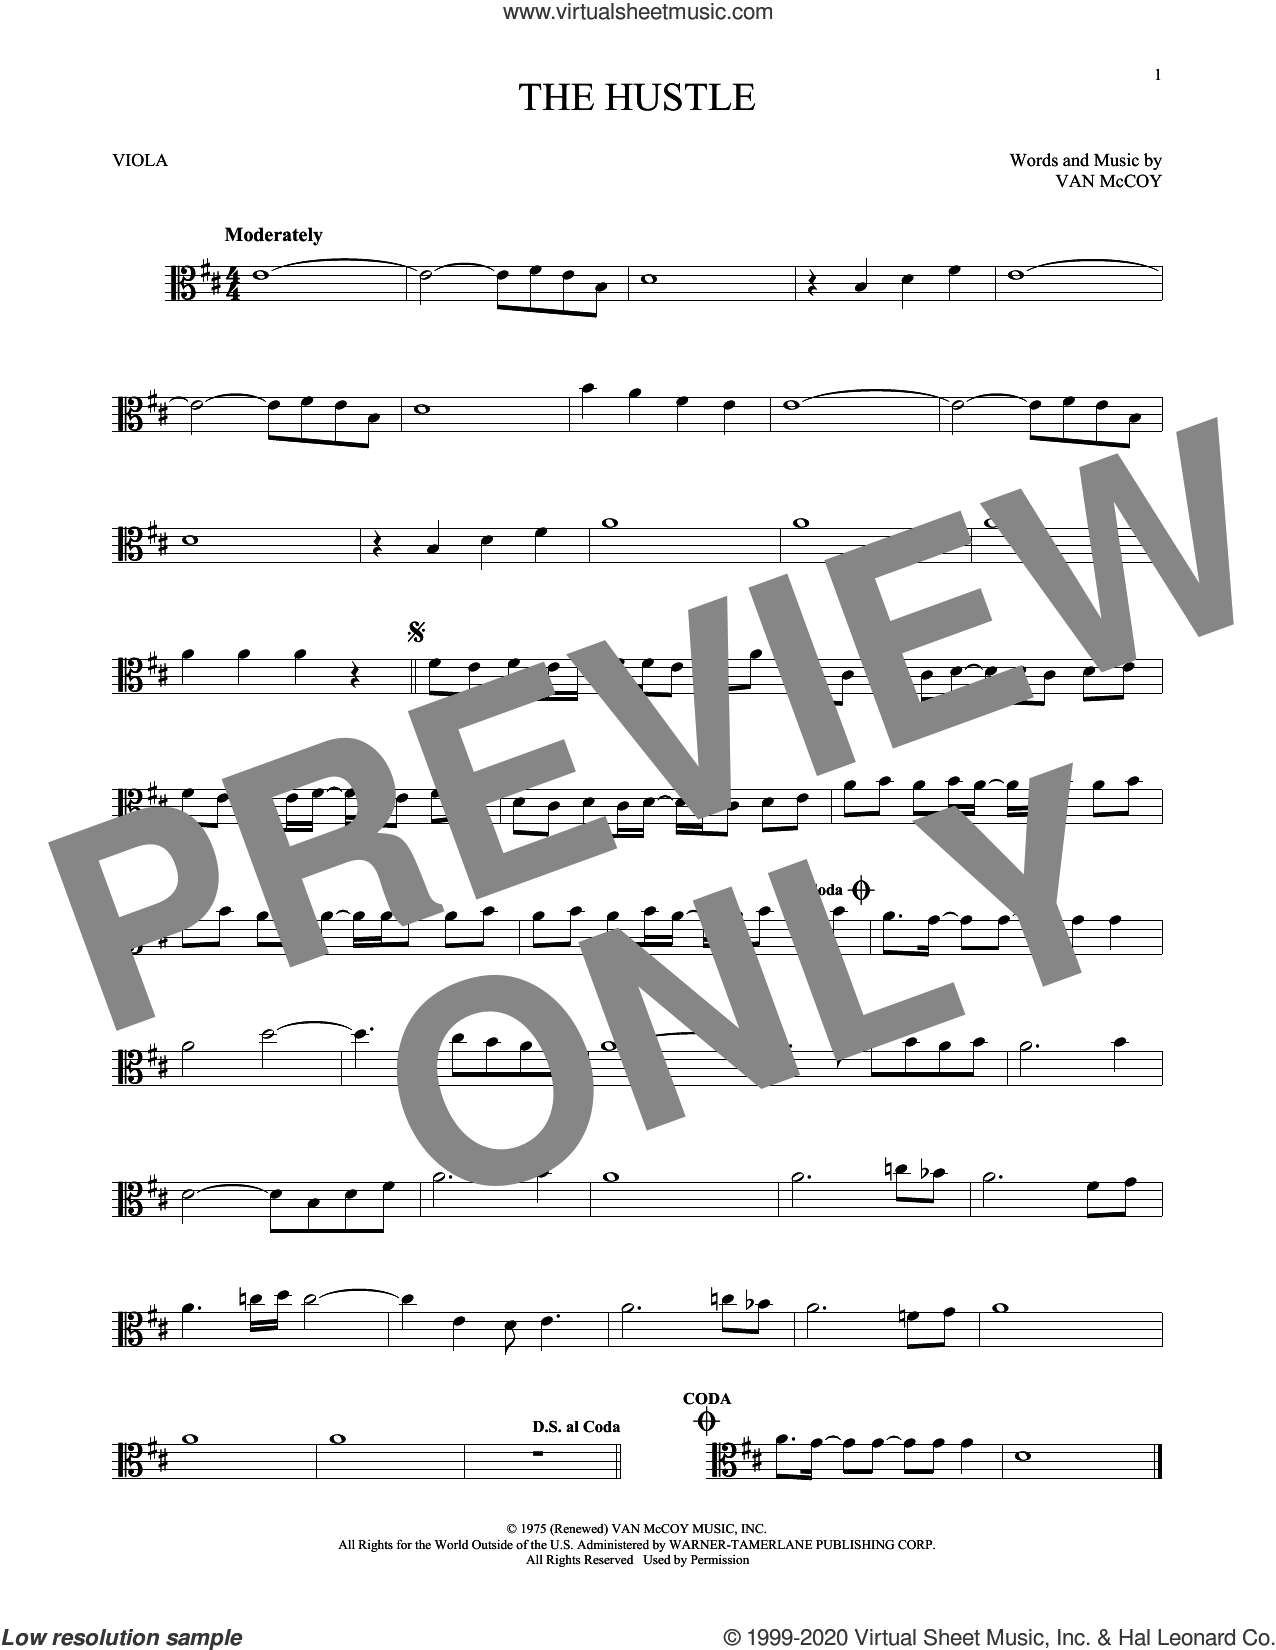 The Hustle sheet music for viola solo by Van McCoy, intermediate skill level